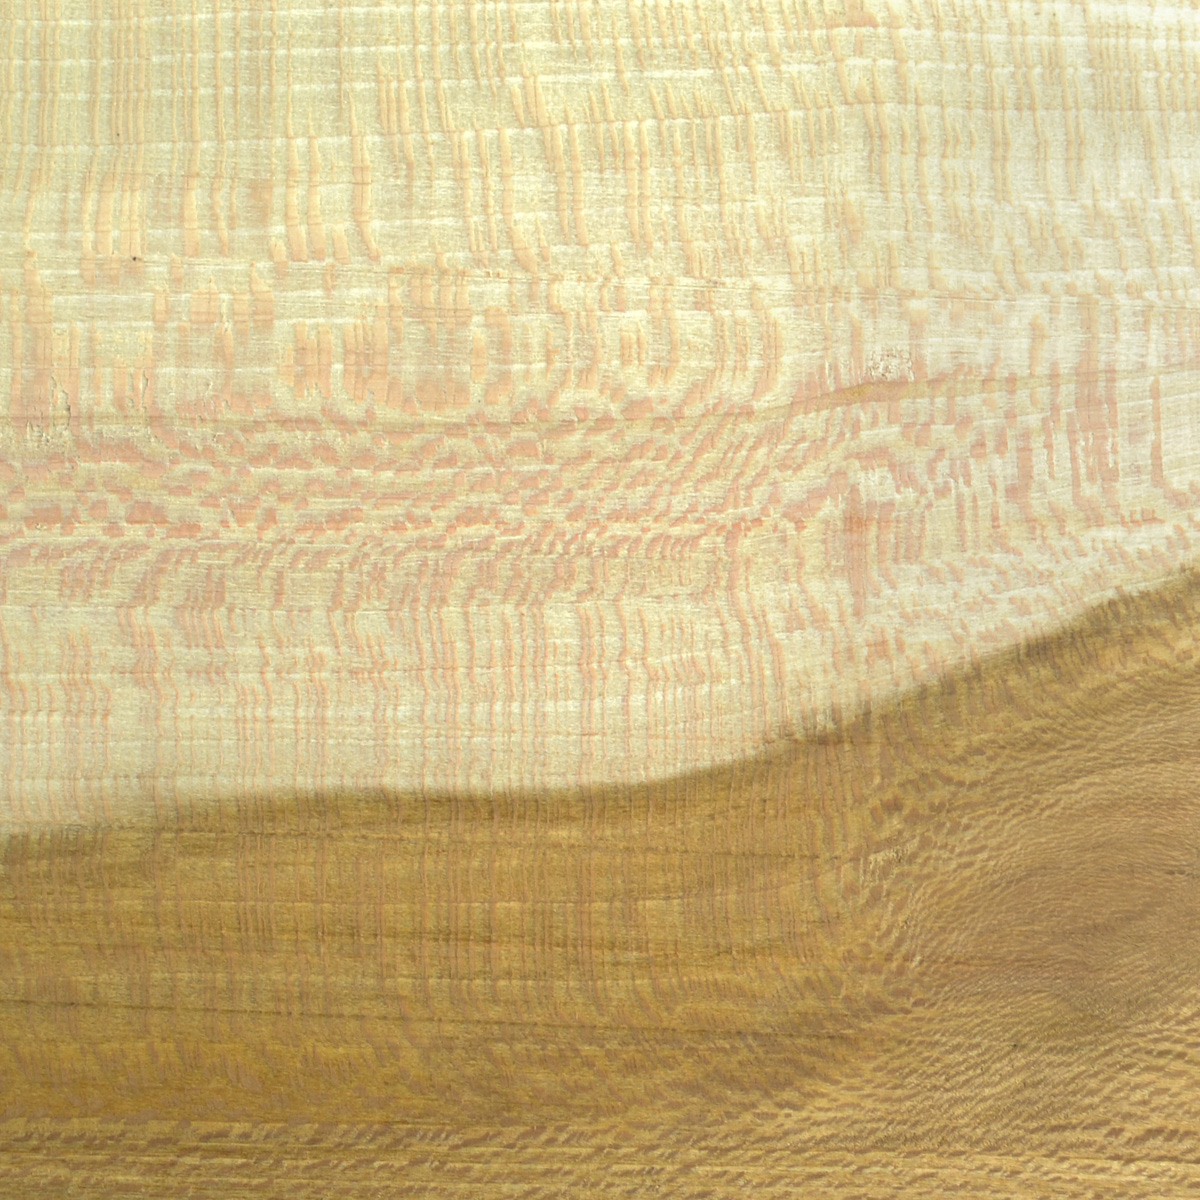 Quarter Sawn Sycamore wood grain close up